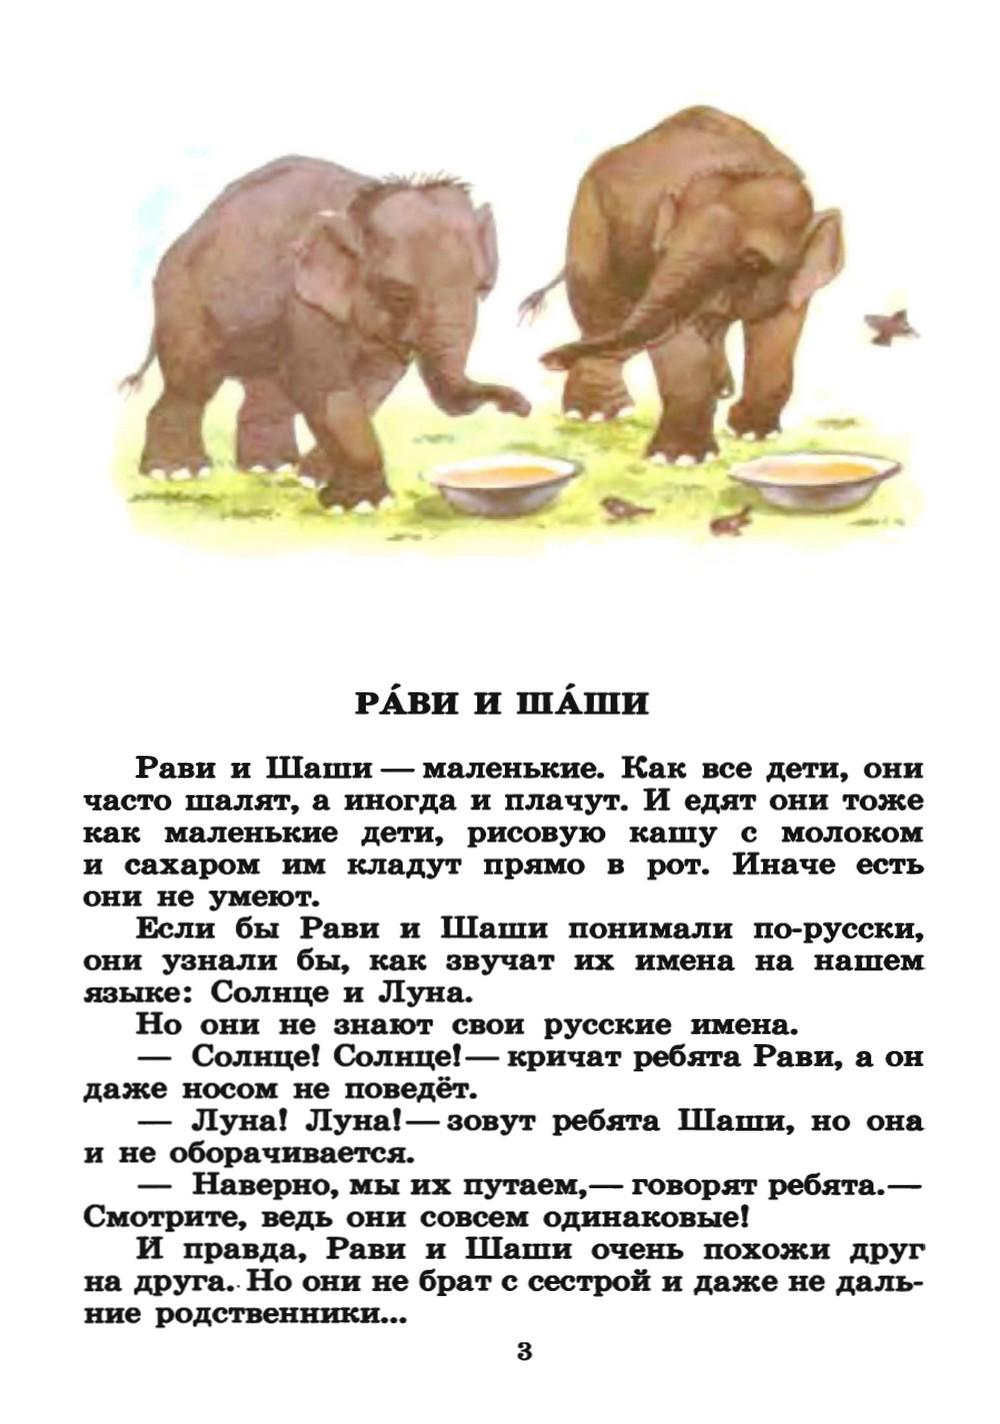 http://i2.imageban.ru/out/2013/09/22/85a54aef33ab0d60ffc5f249c82b05b2.jpg